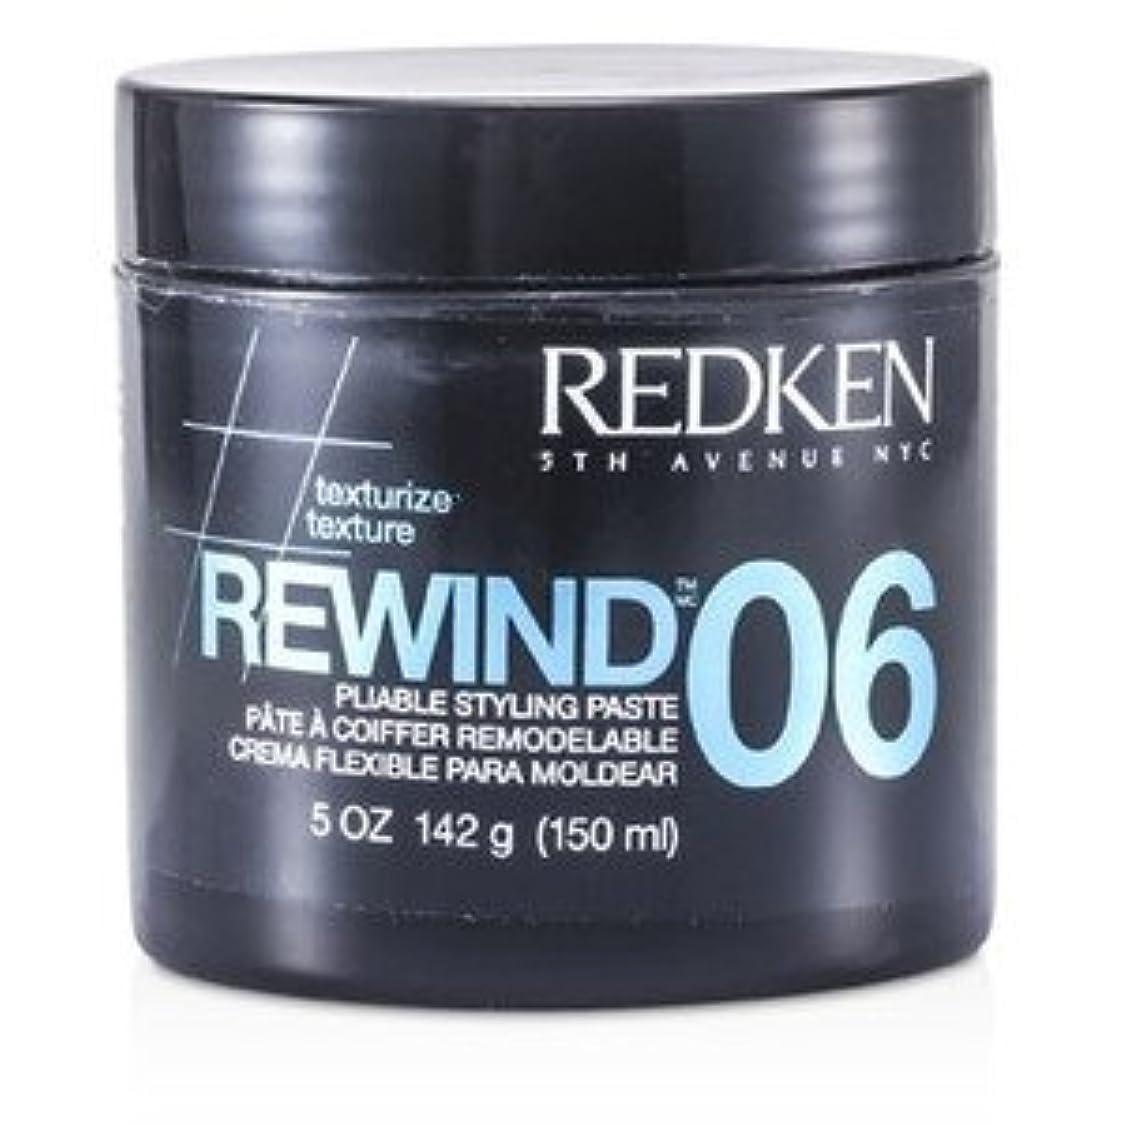 Redken スタイリング リウィンド 06 プライアブル スタイリング ペースト 150ml/5oz [並行輸入品]